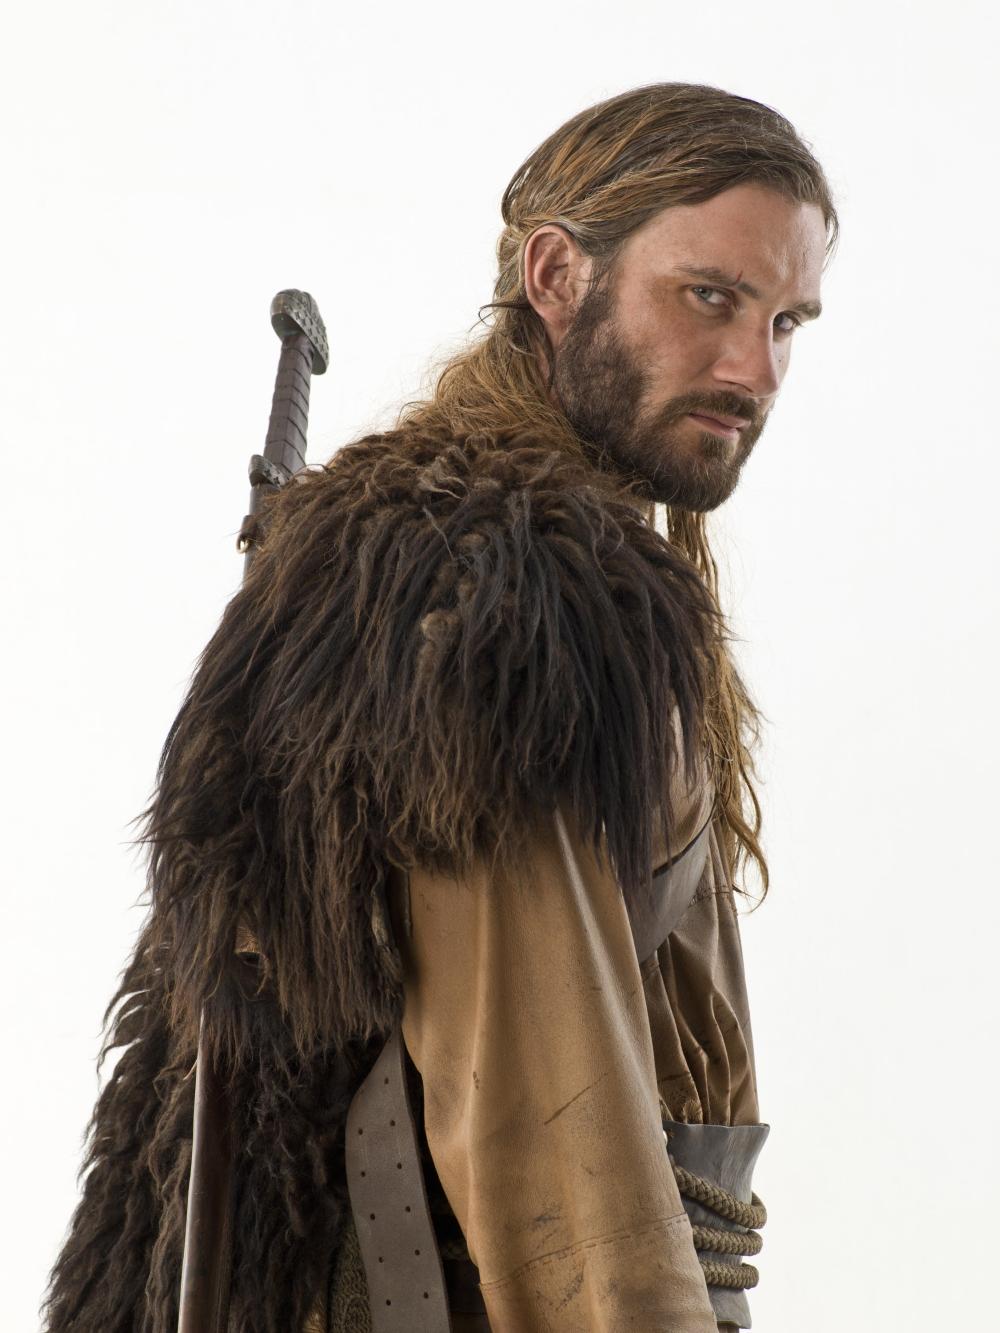 Rollo .................... Vikings-Promo-Rollo-vikings-tv-series-33876619-1000-1333